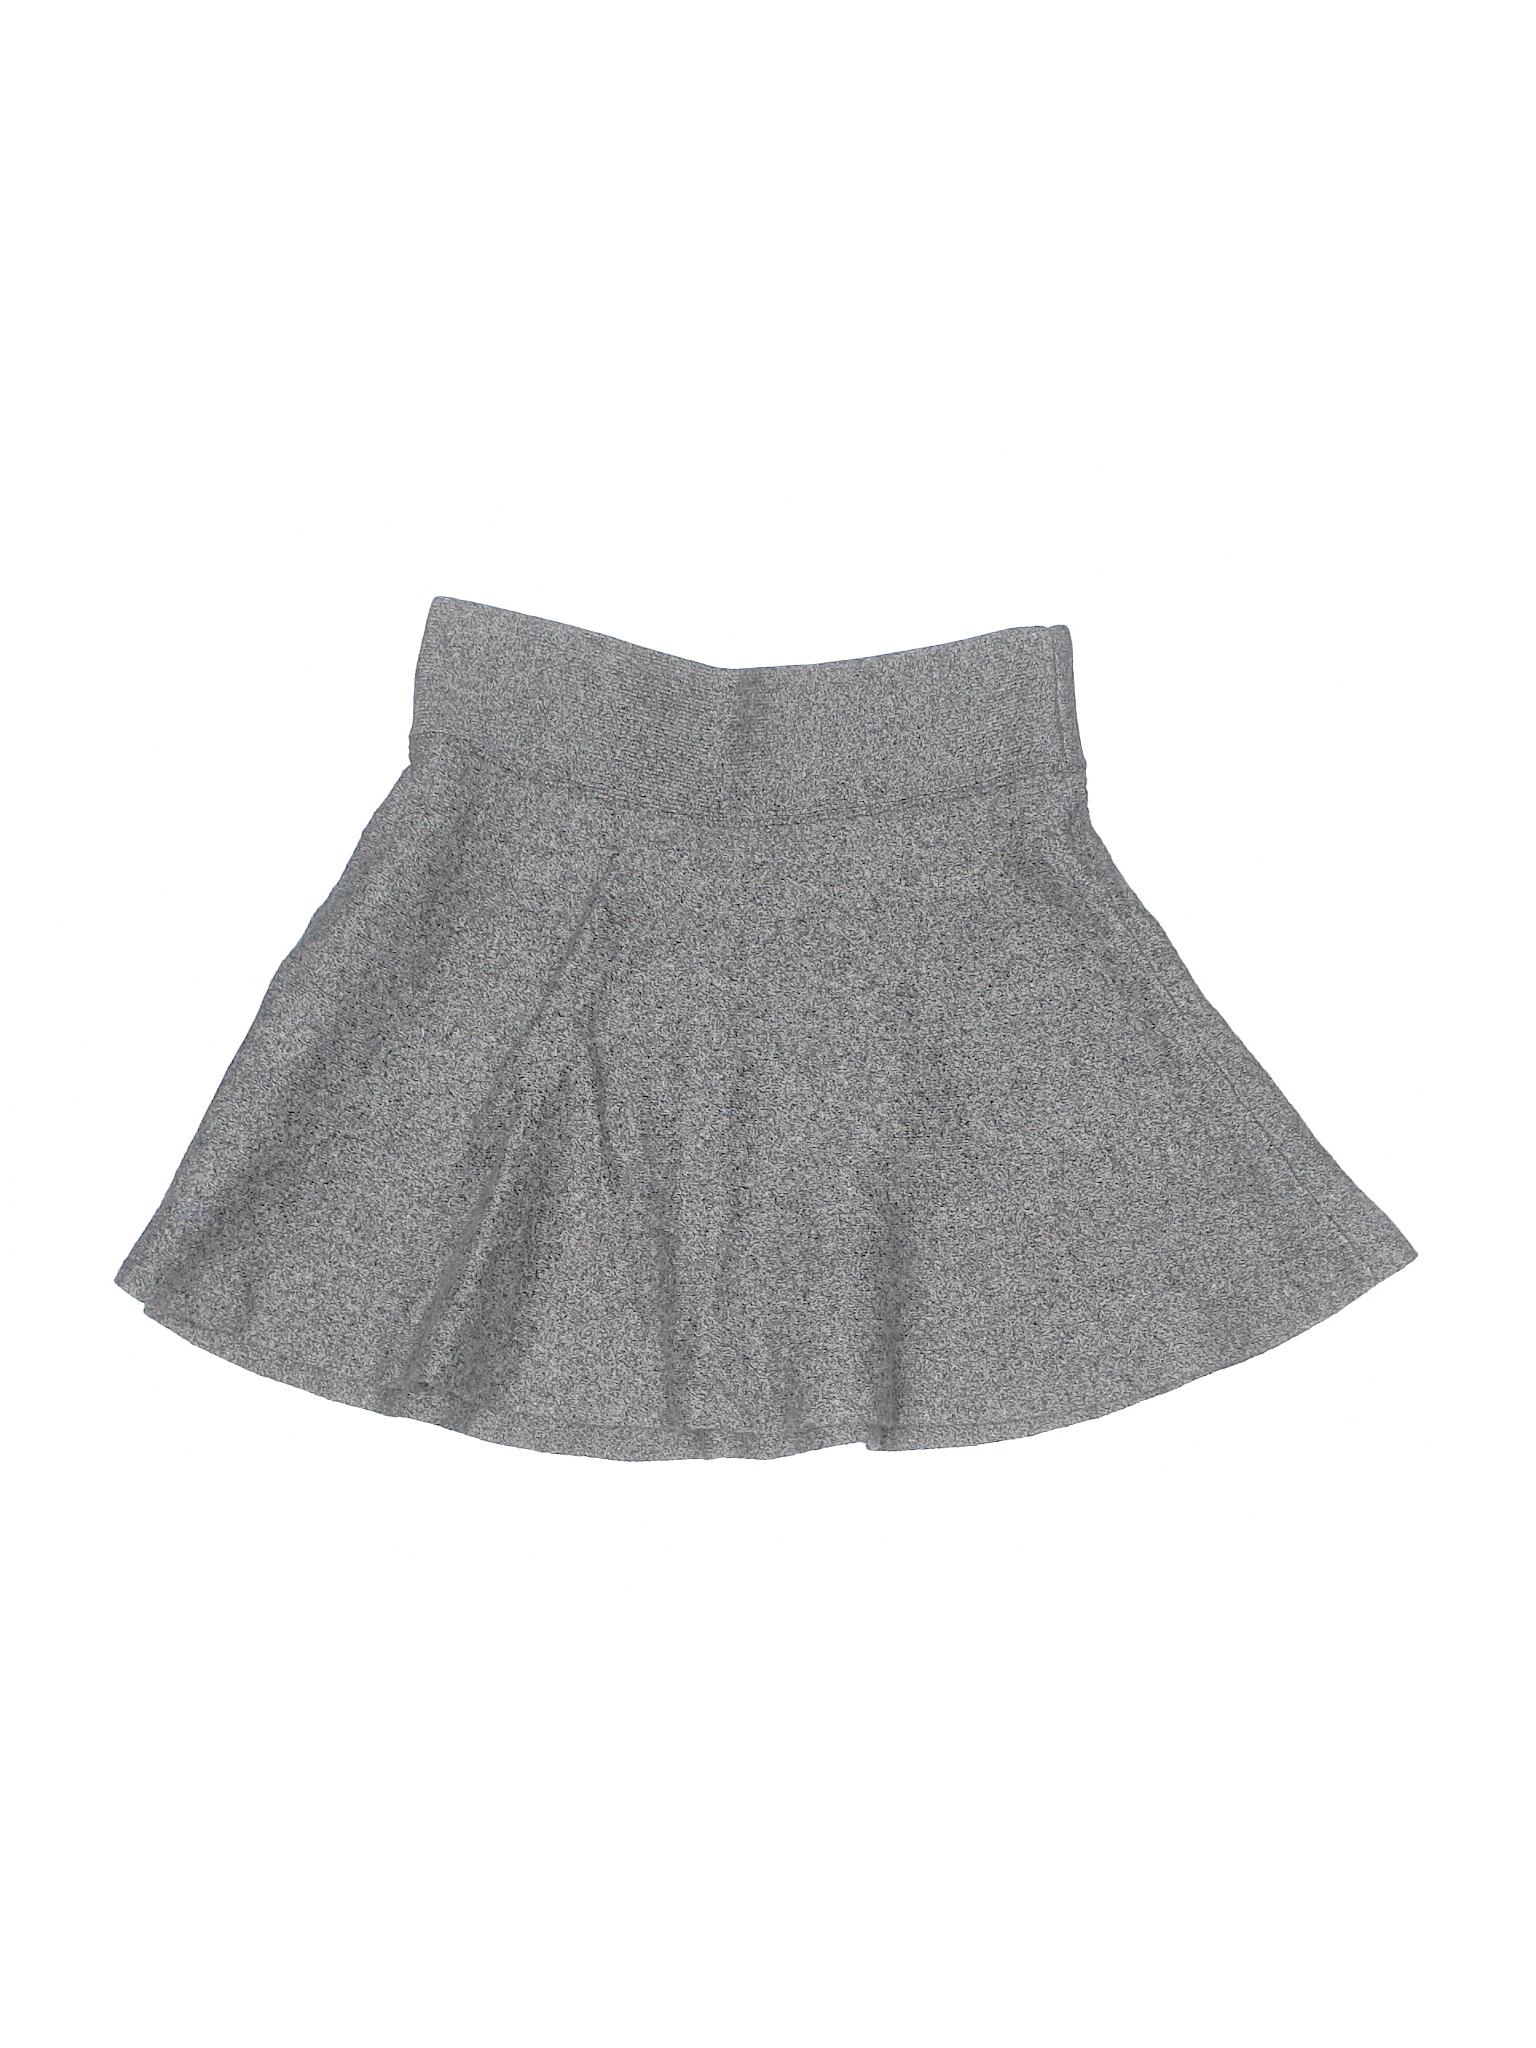 Boutique Boutique Talula Casual Casual Skirt Skirt Boutique leisure Talula leisure leisure Talula wxXUYa1qq